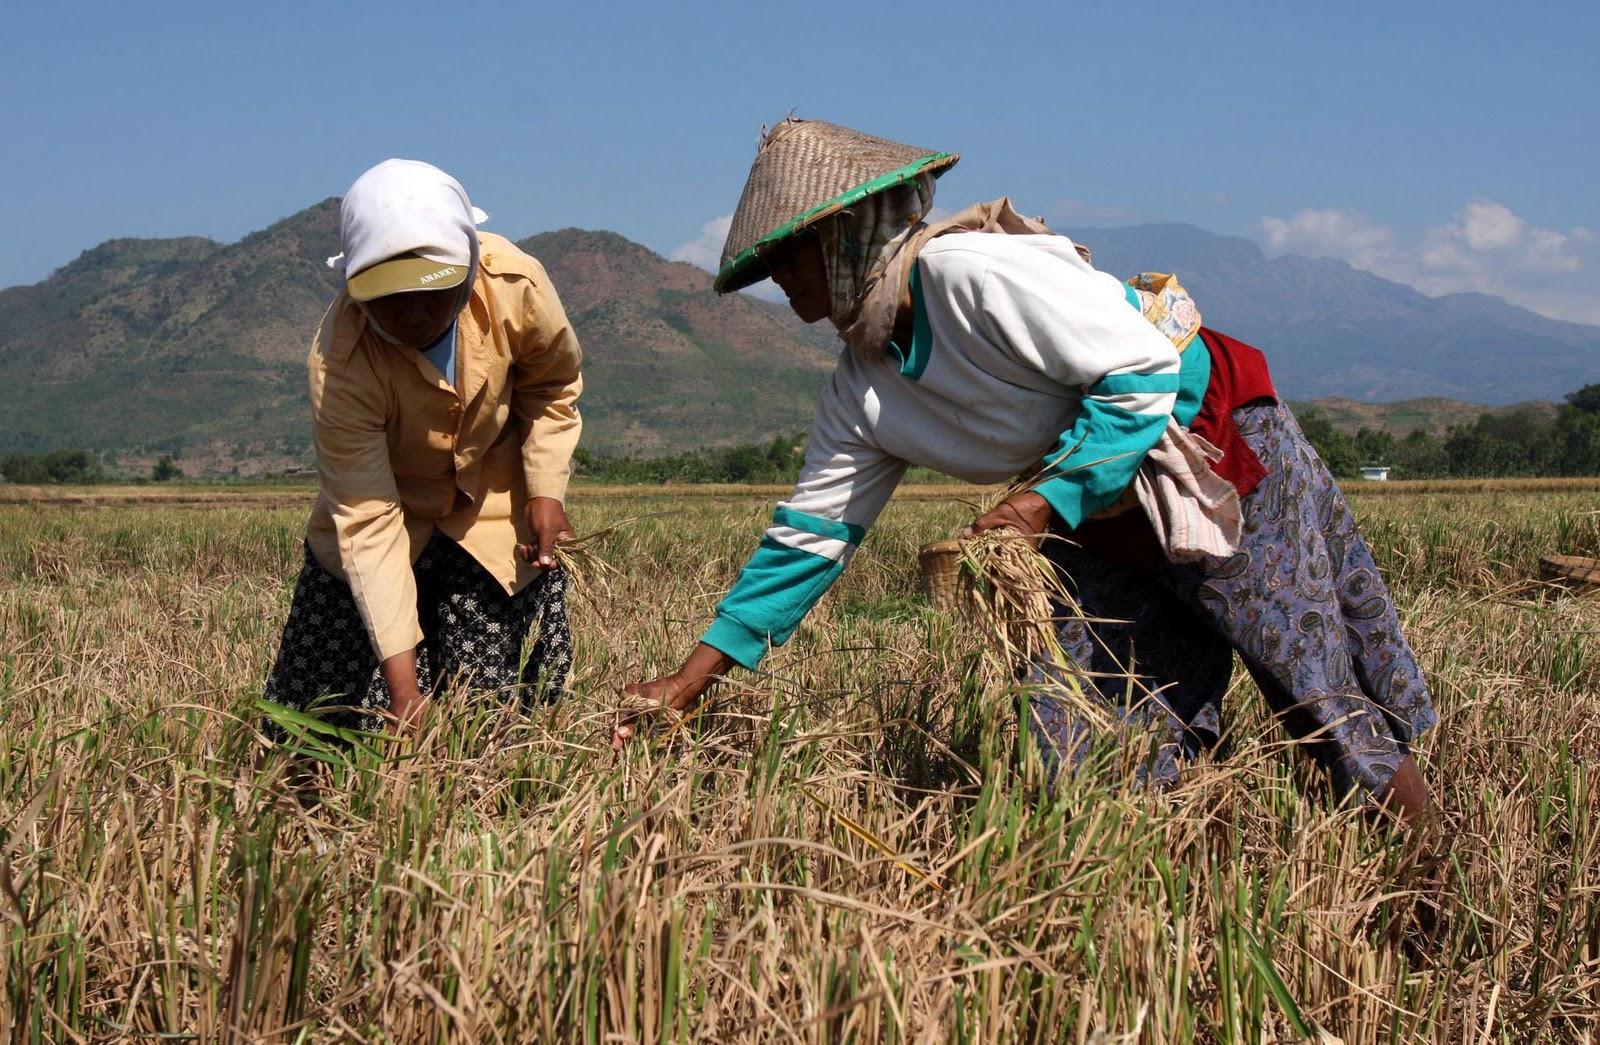 Melepas Lelah Petani Indonesia Miskin Siapa Peduli Bag 2 Selesai